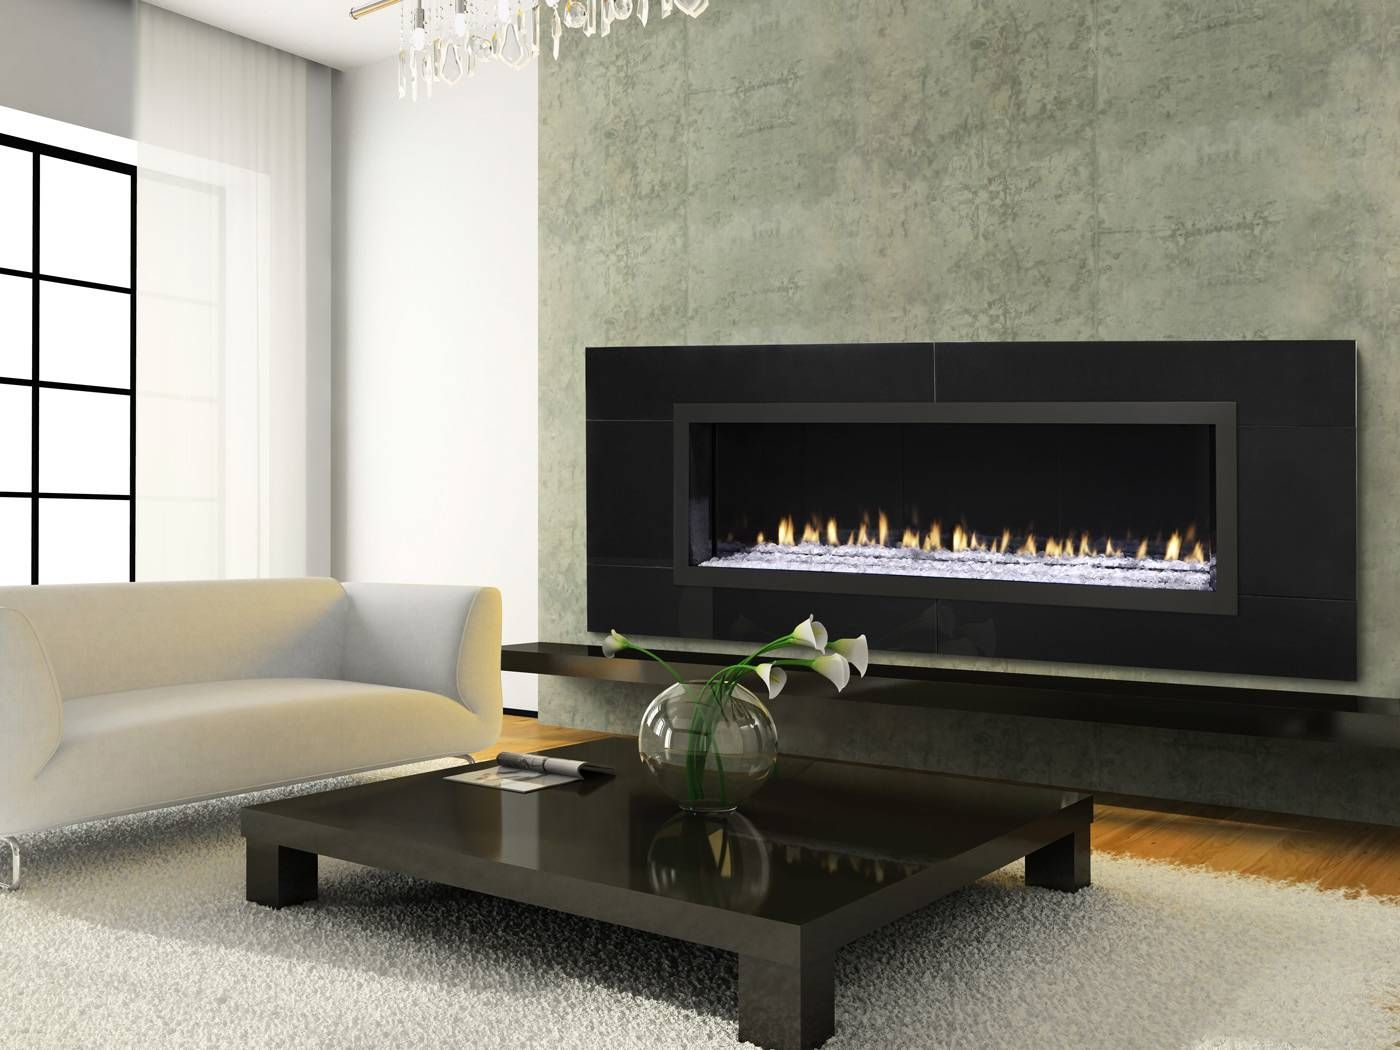 Modern Architecture Fireplace Rectangular European Design Heat